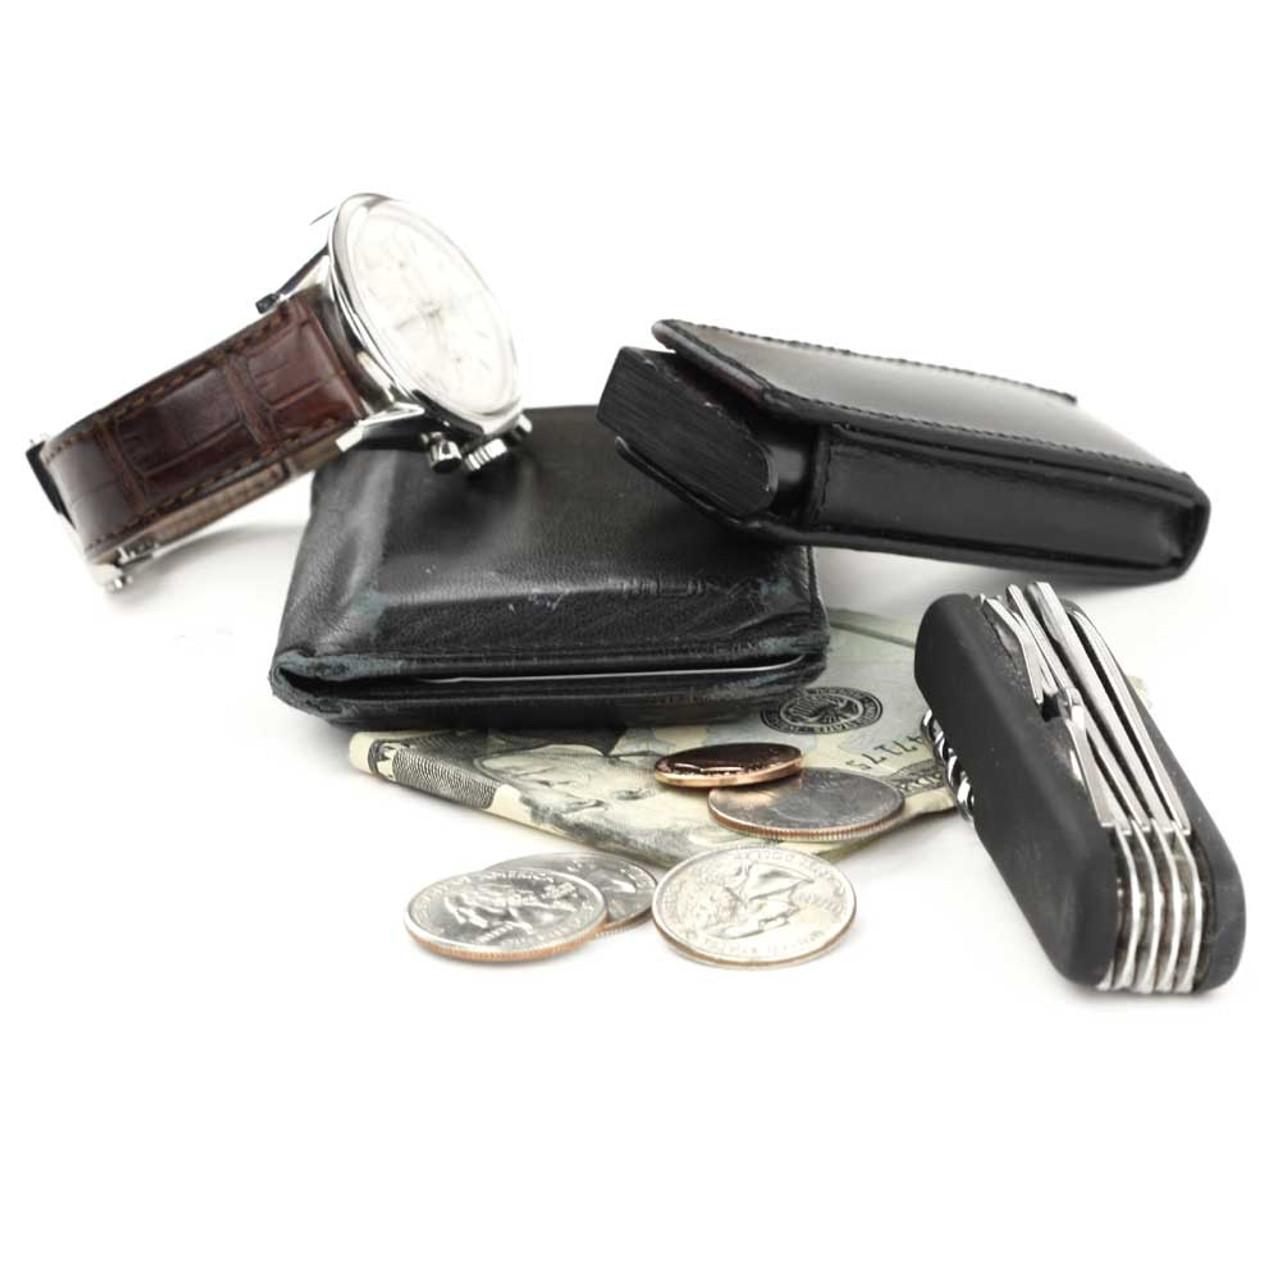 Glock 19 Magazine Pocket Protector